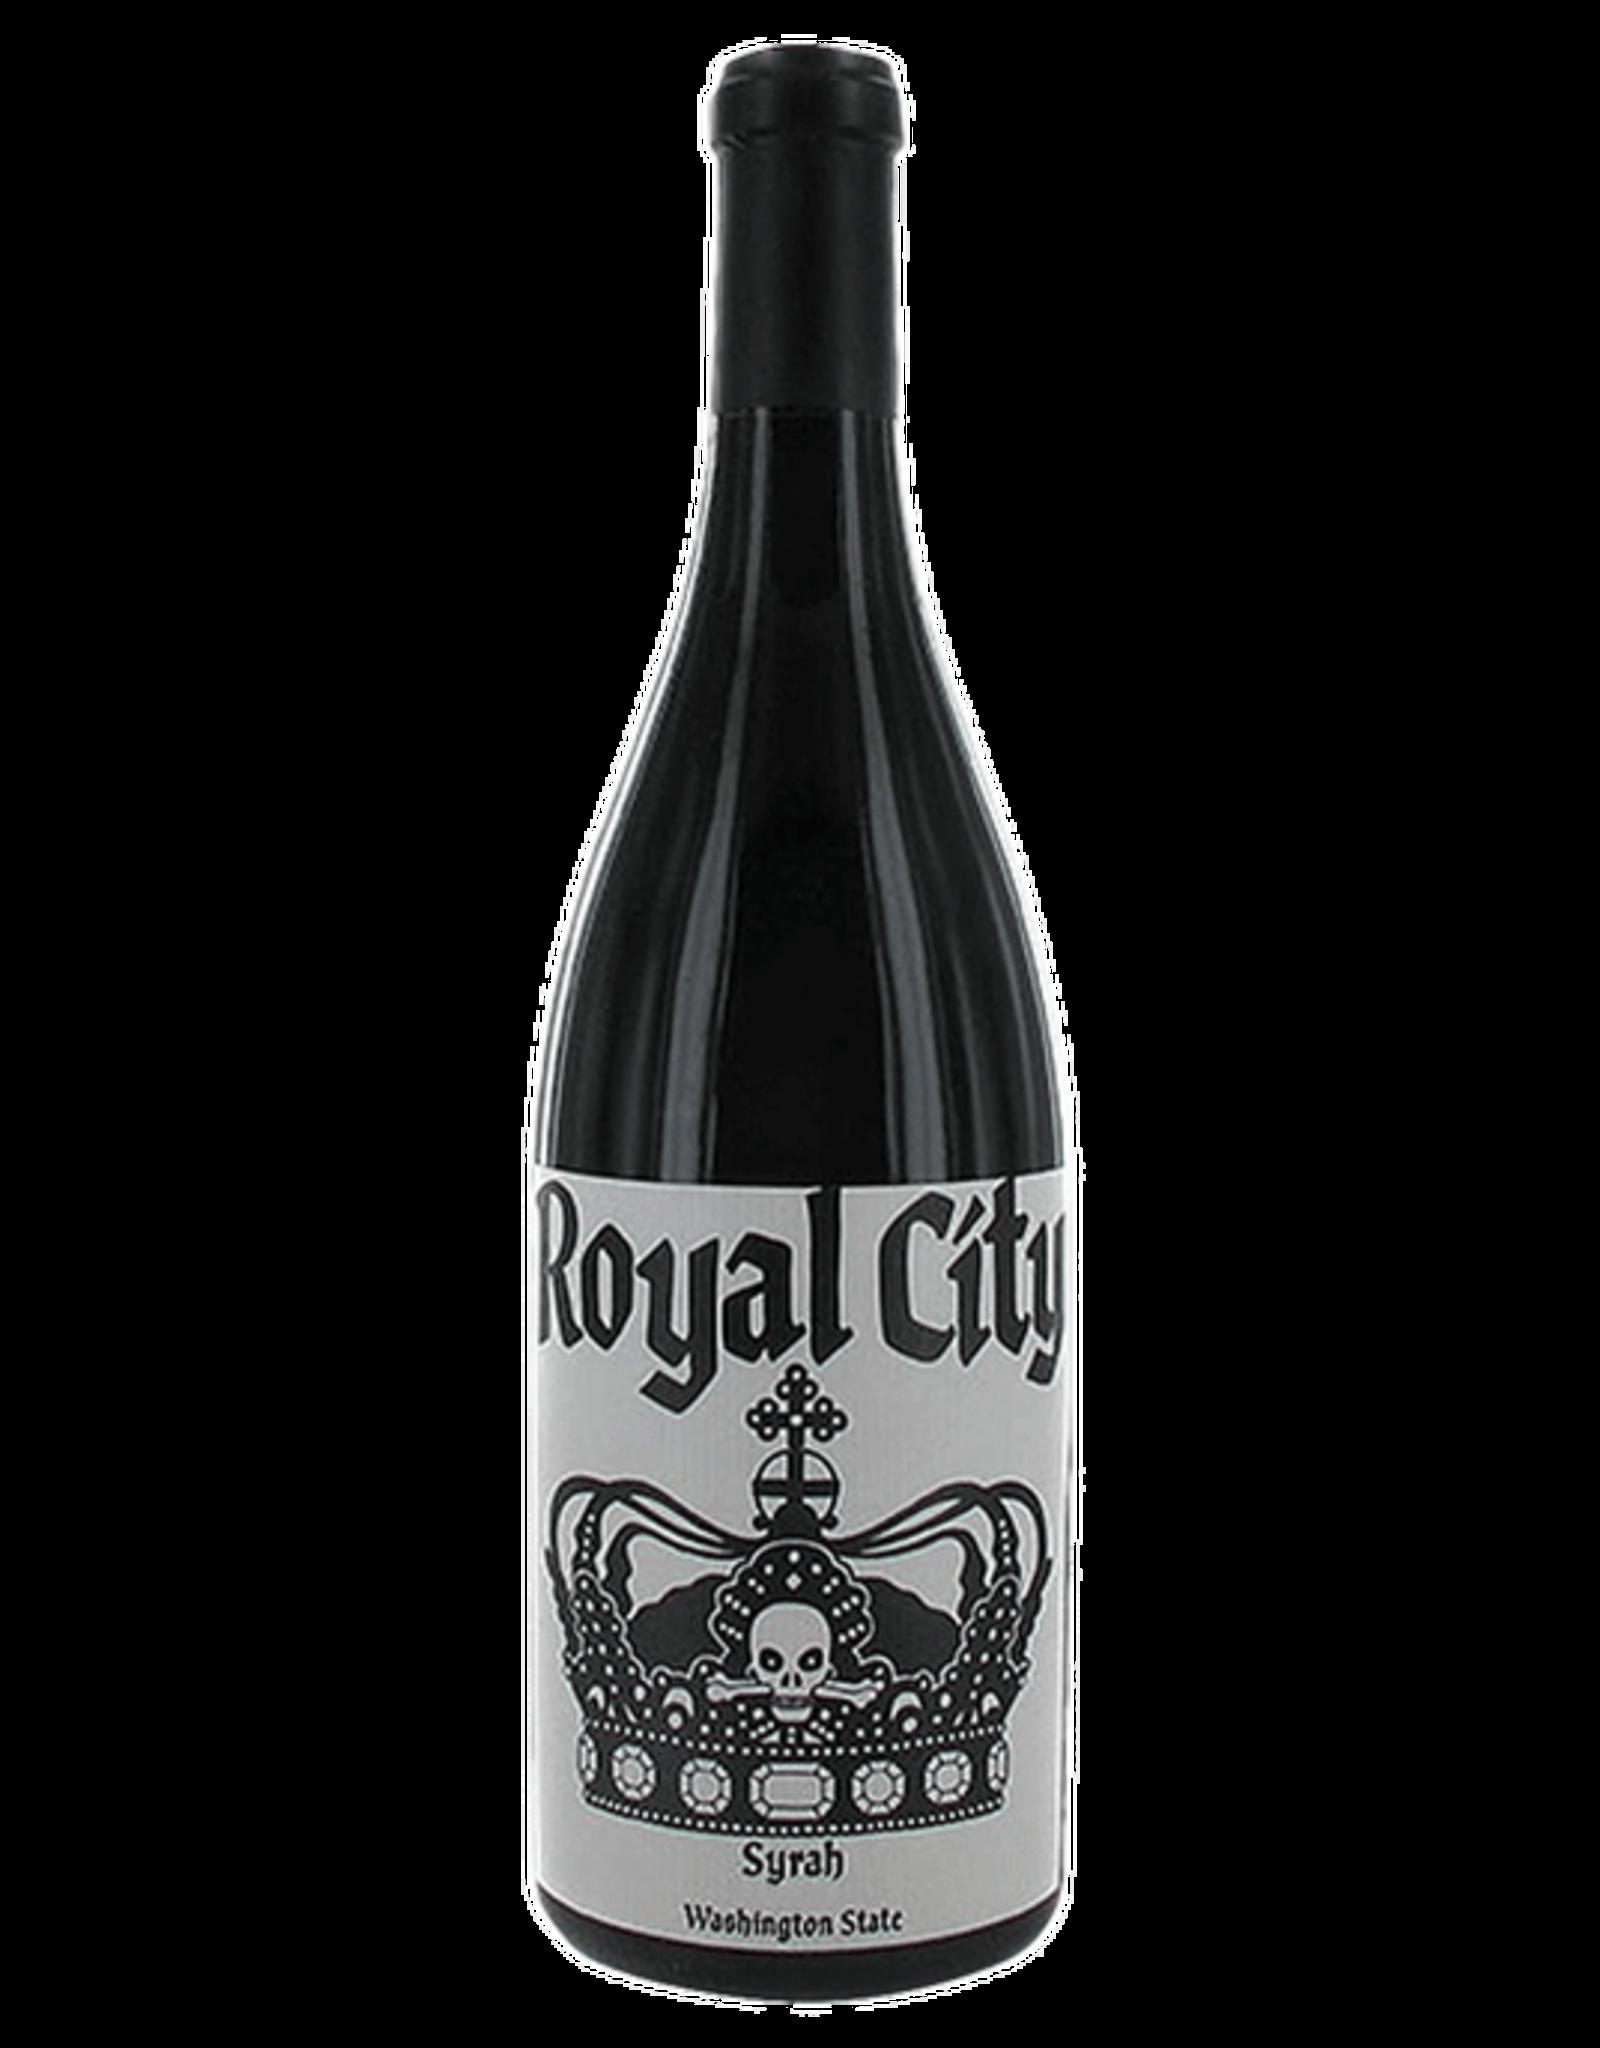 K Vintners Charles Smith Royal City Syrah 2012